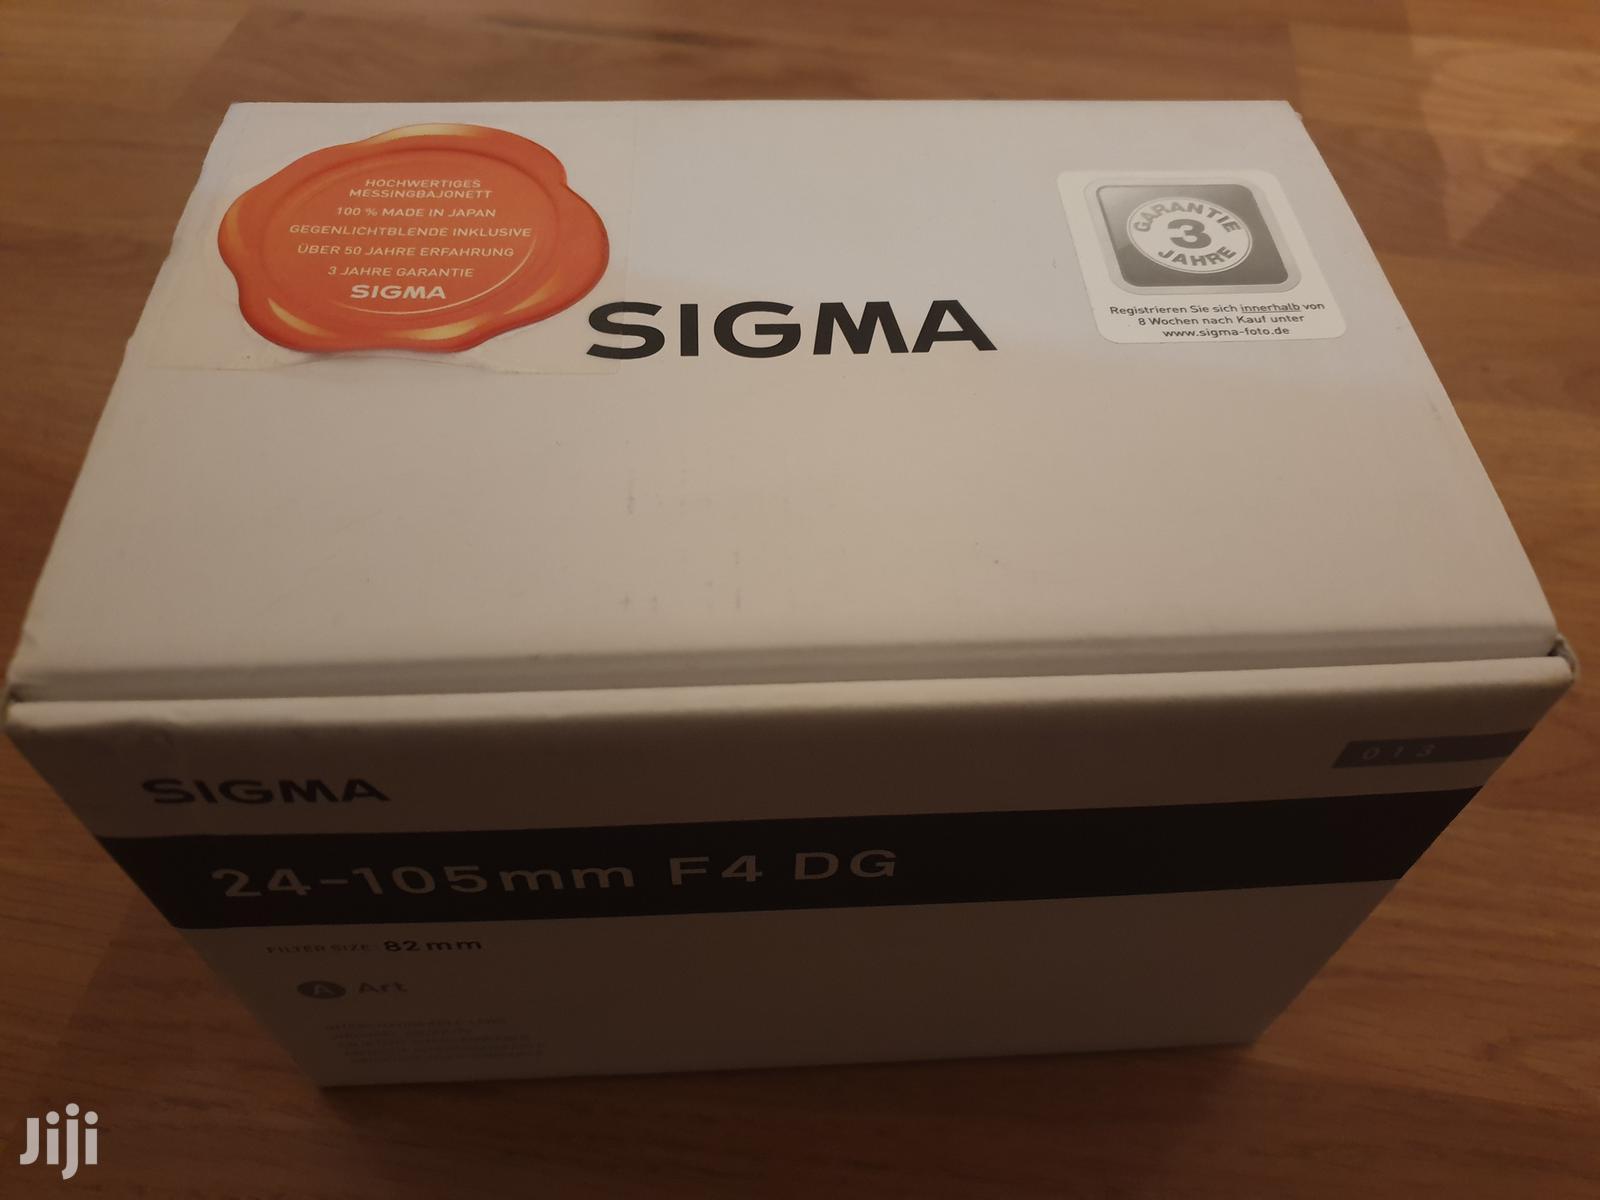 Canon Fit Sigma 24-105mm F4 Dg Art Lens